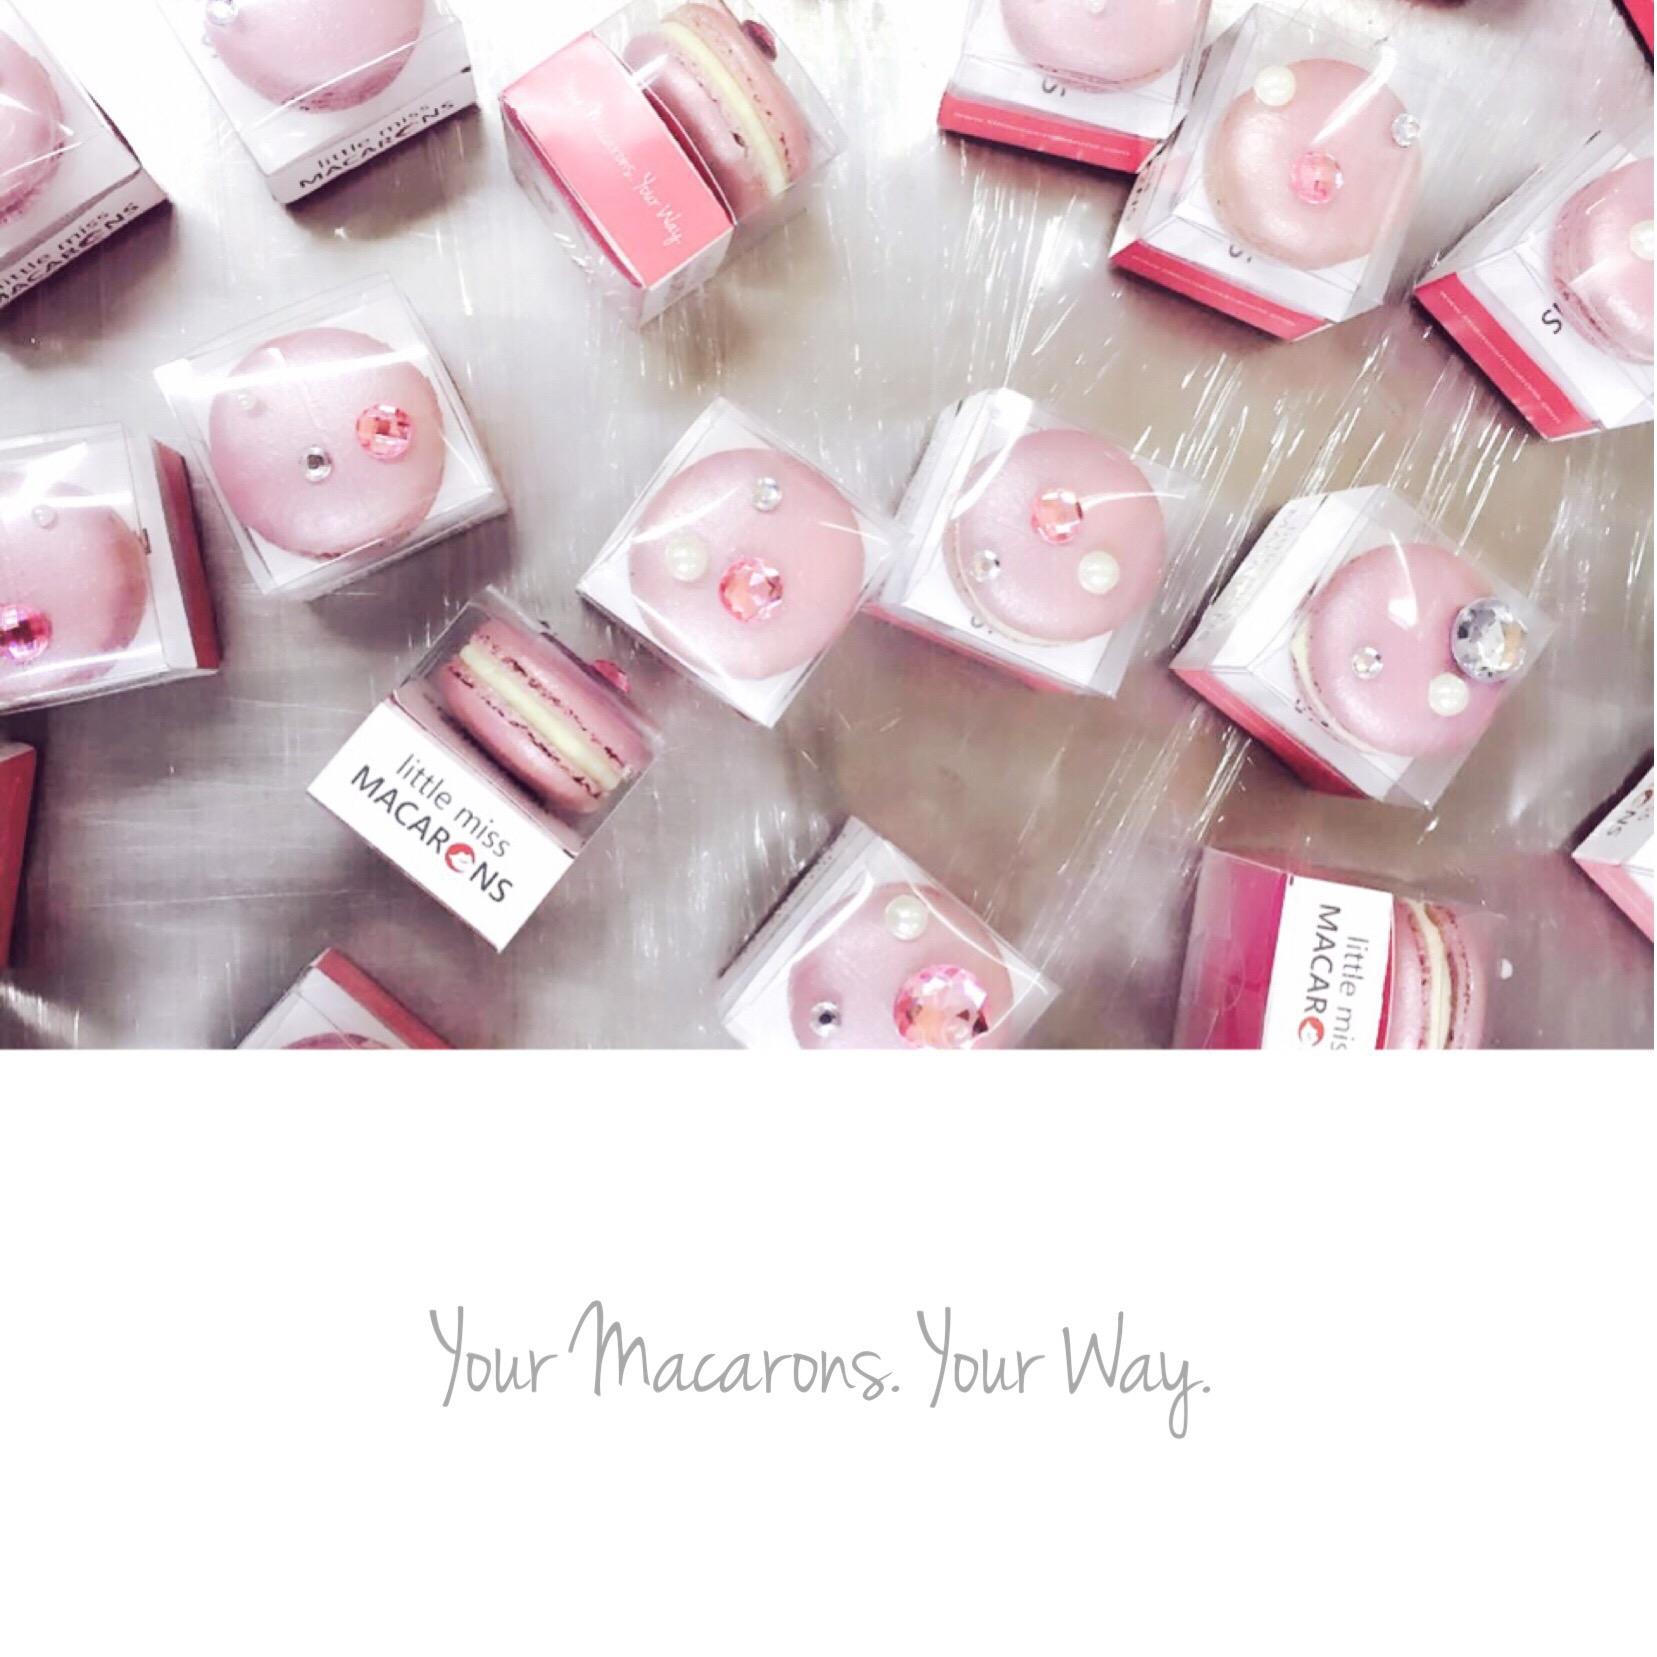 Macaron Gift Box & Gift Sets – Little Miss Macarons